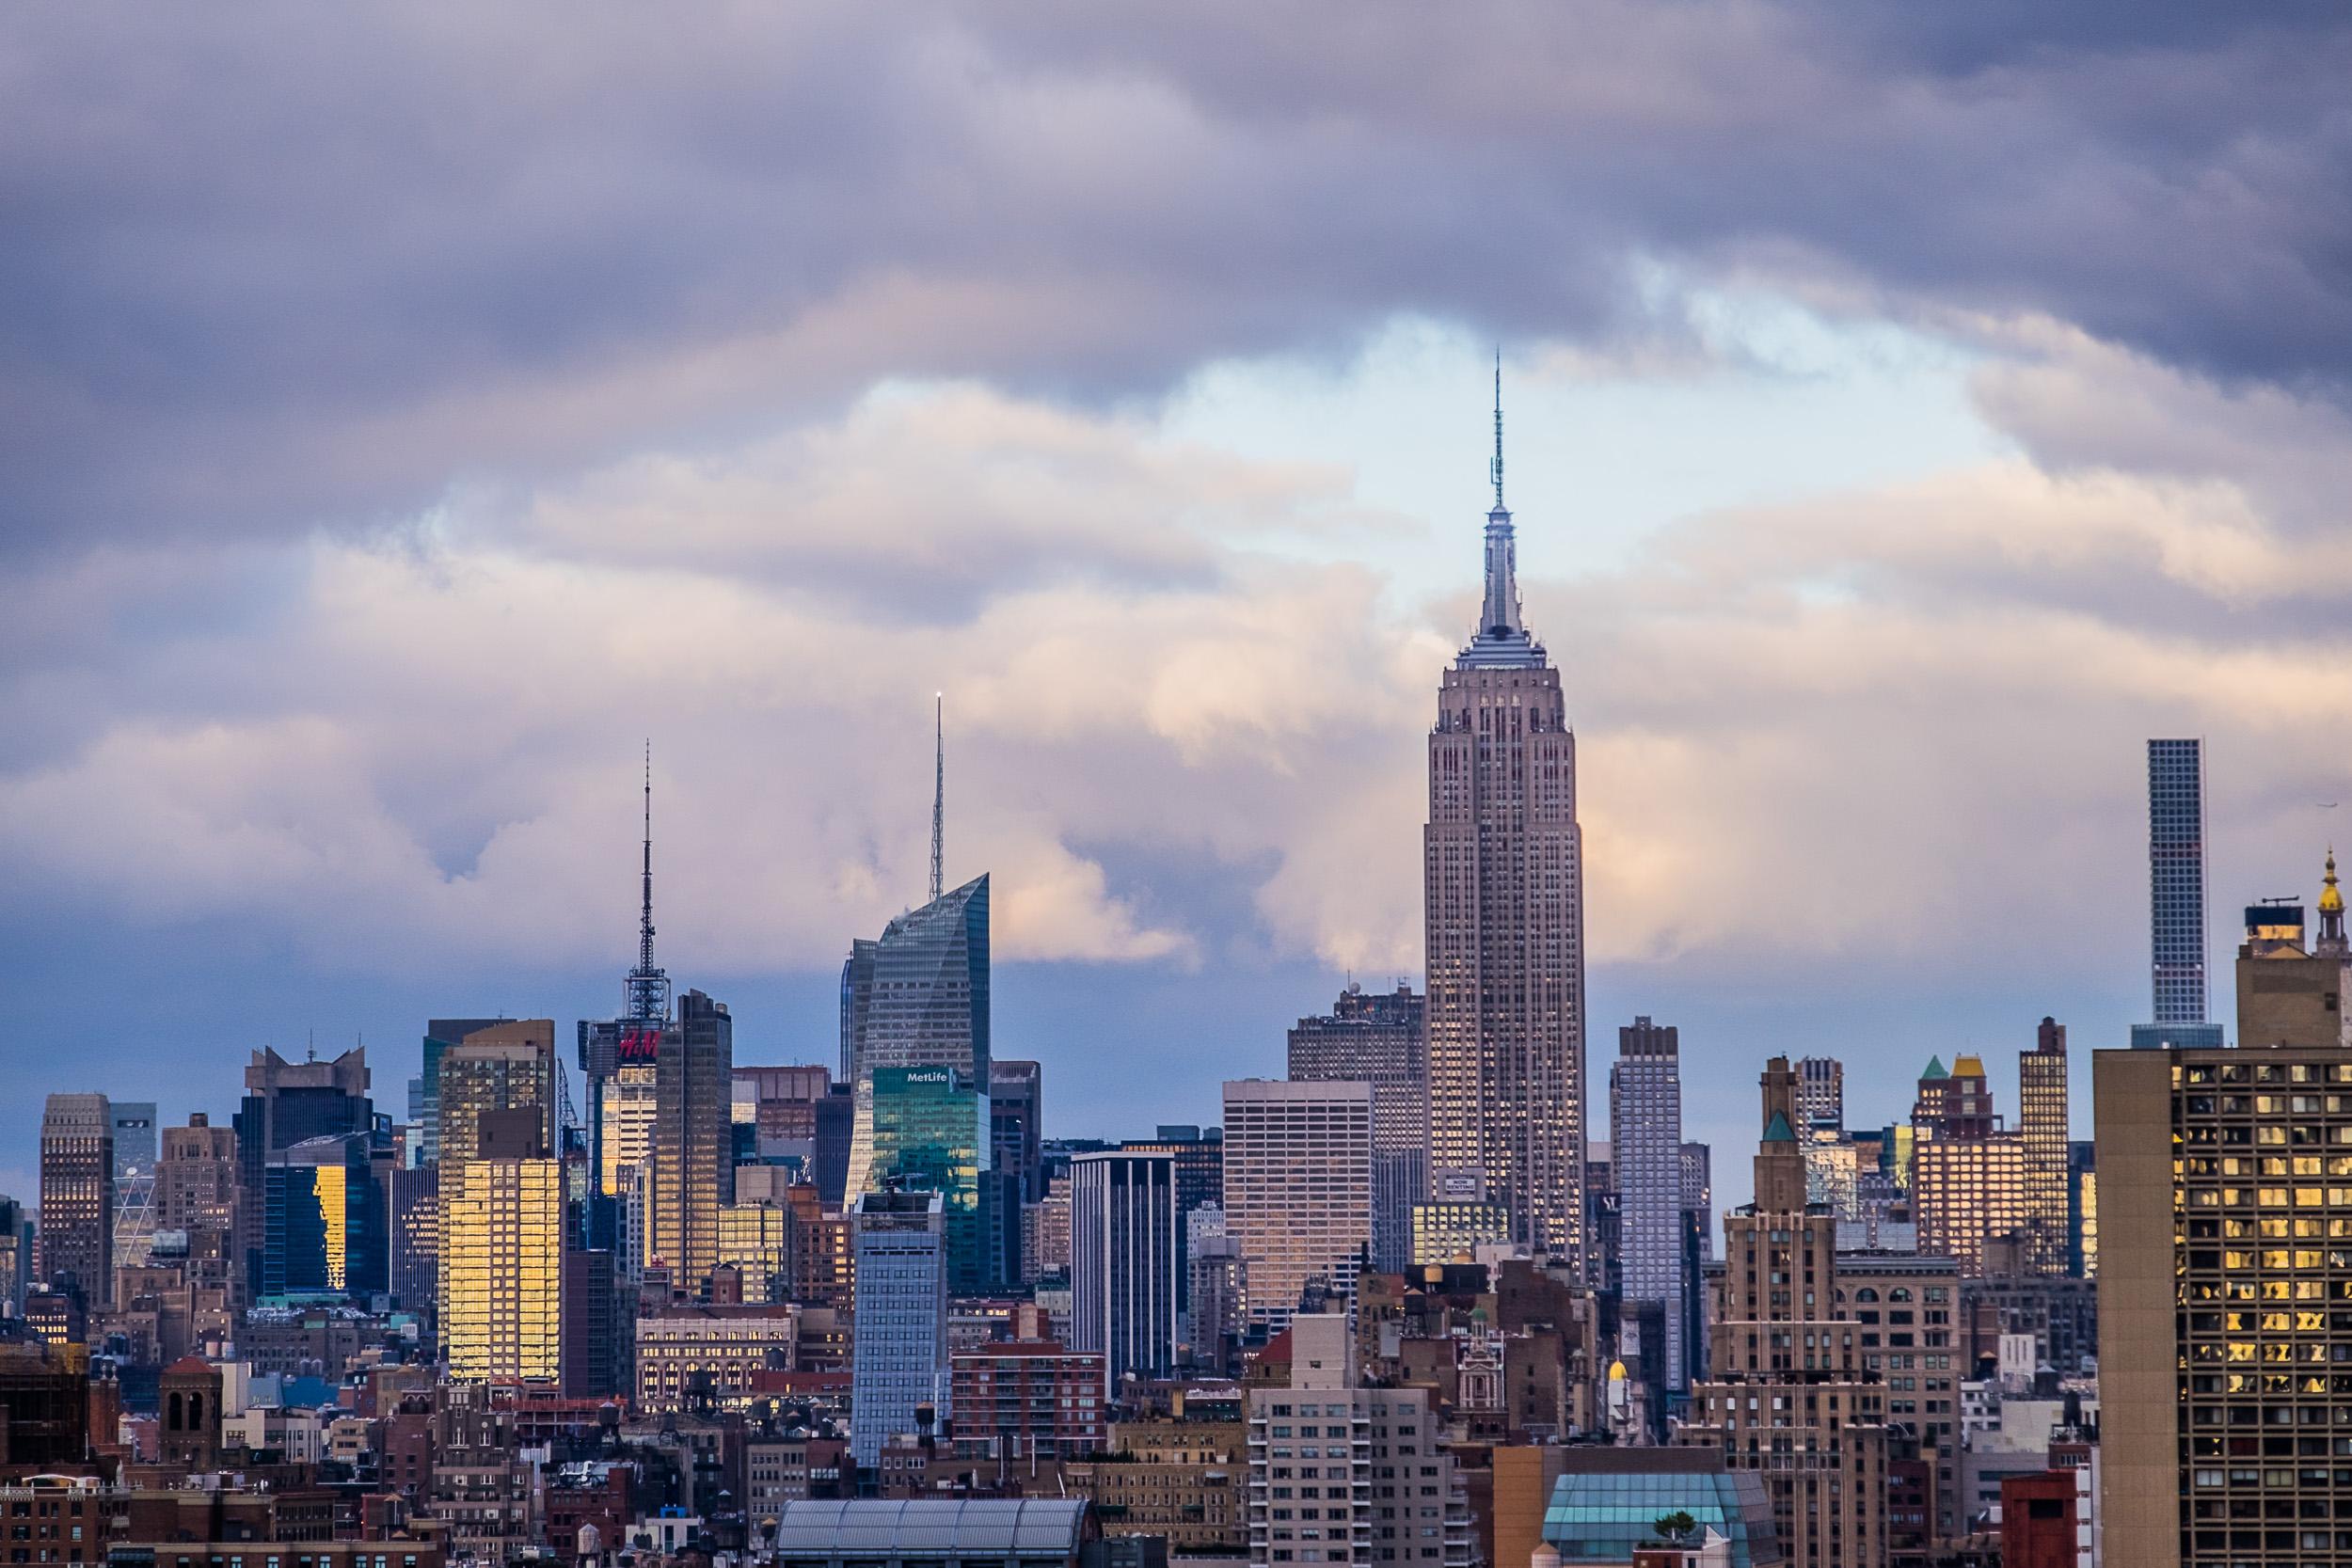 NYC3-1.jpg